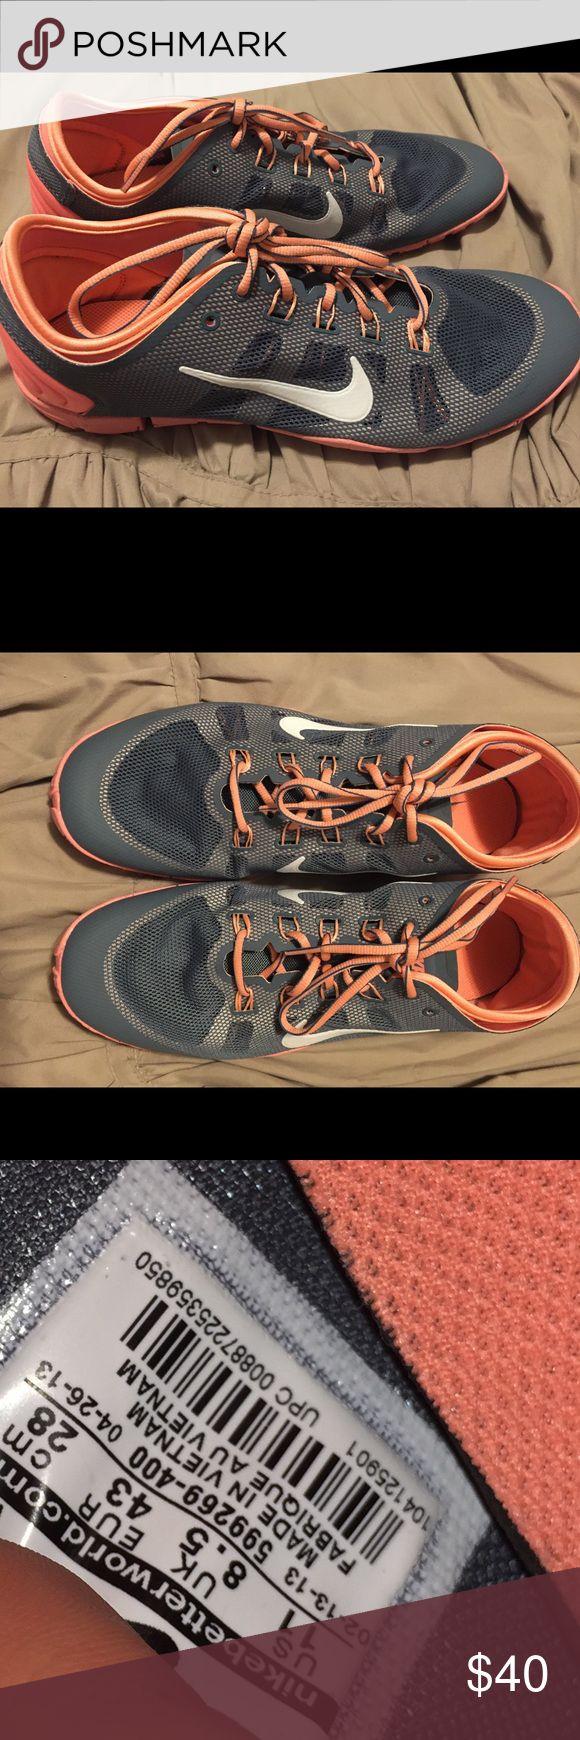 Nike training shoes New Women's Nike training shoes Nike Shoes Athletic Shoes